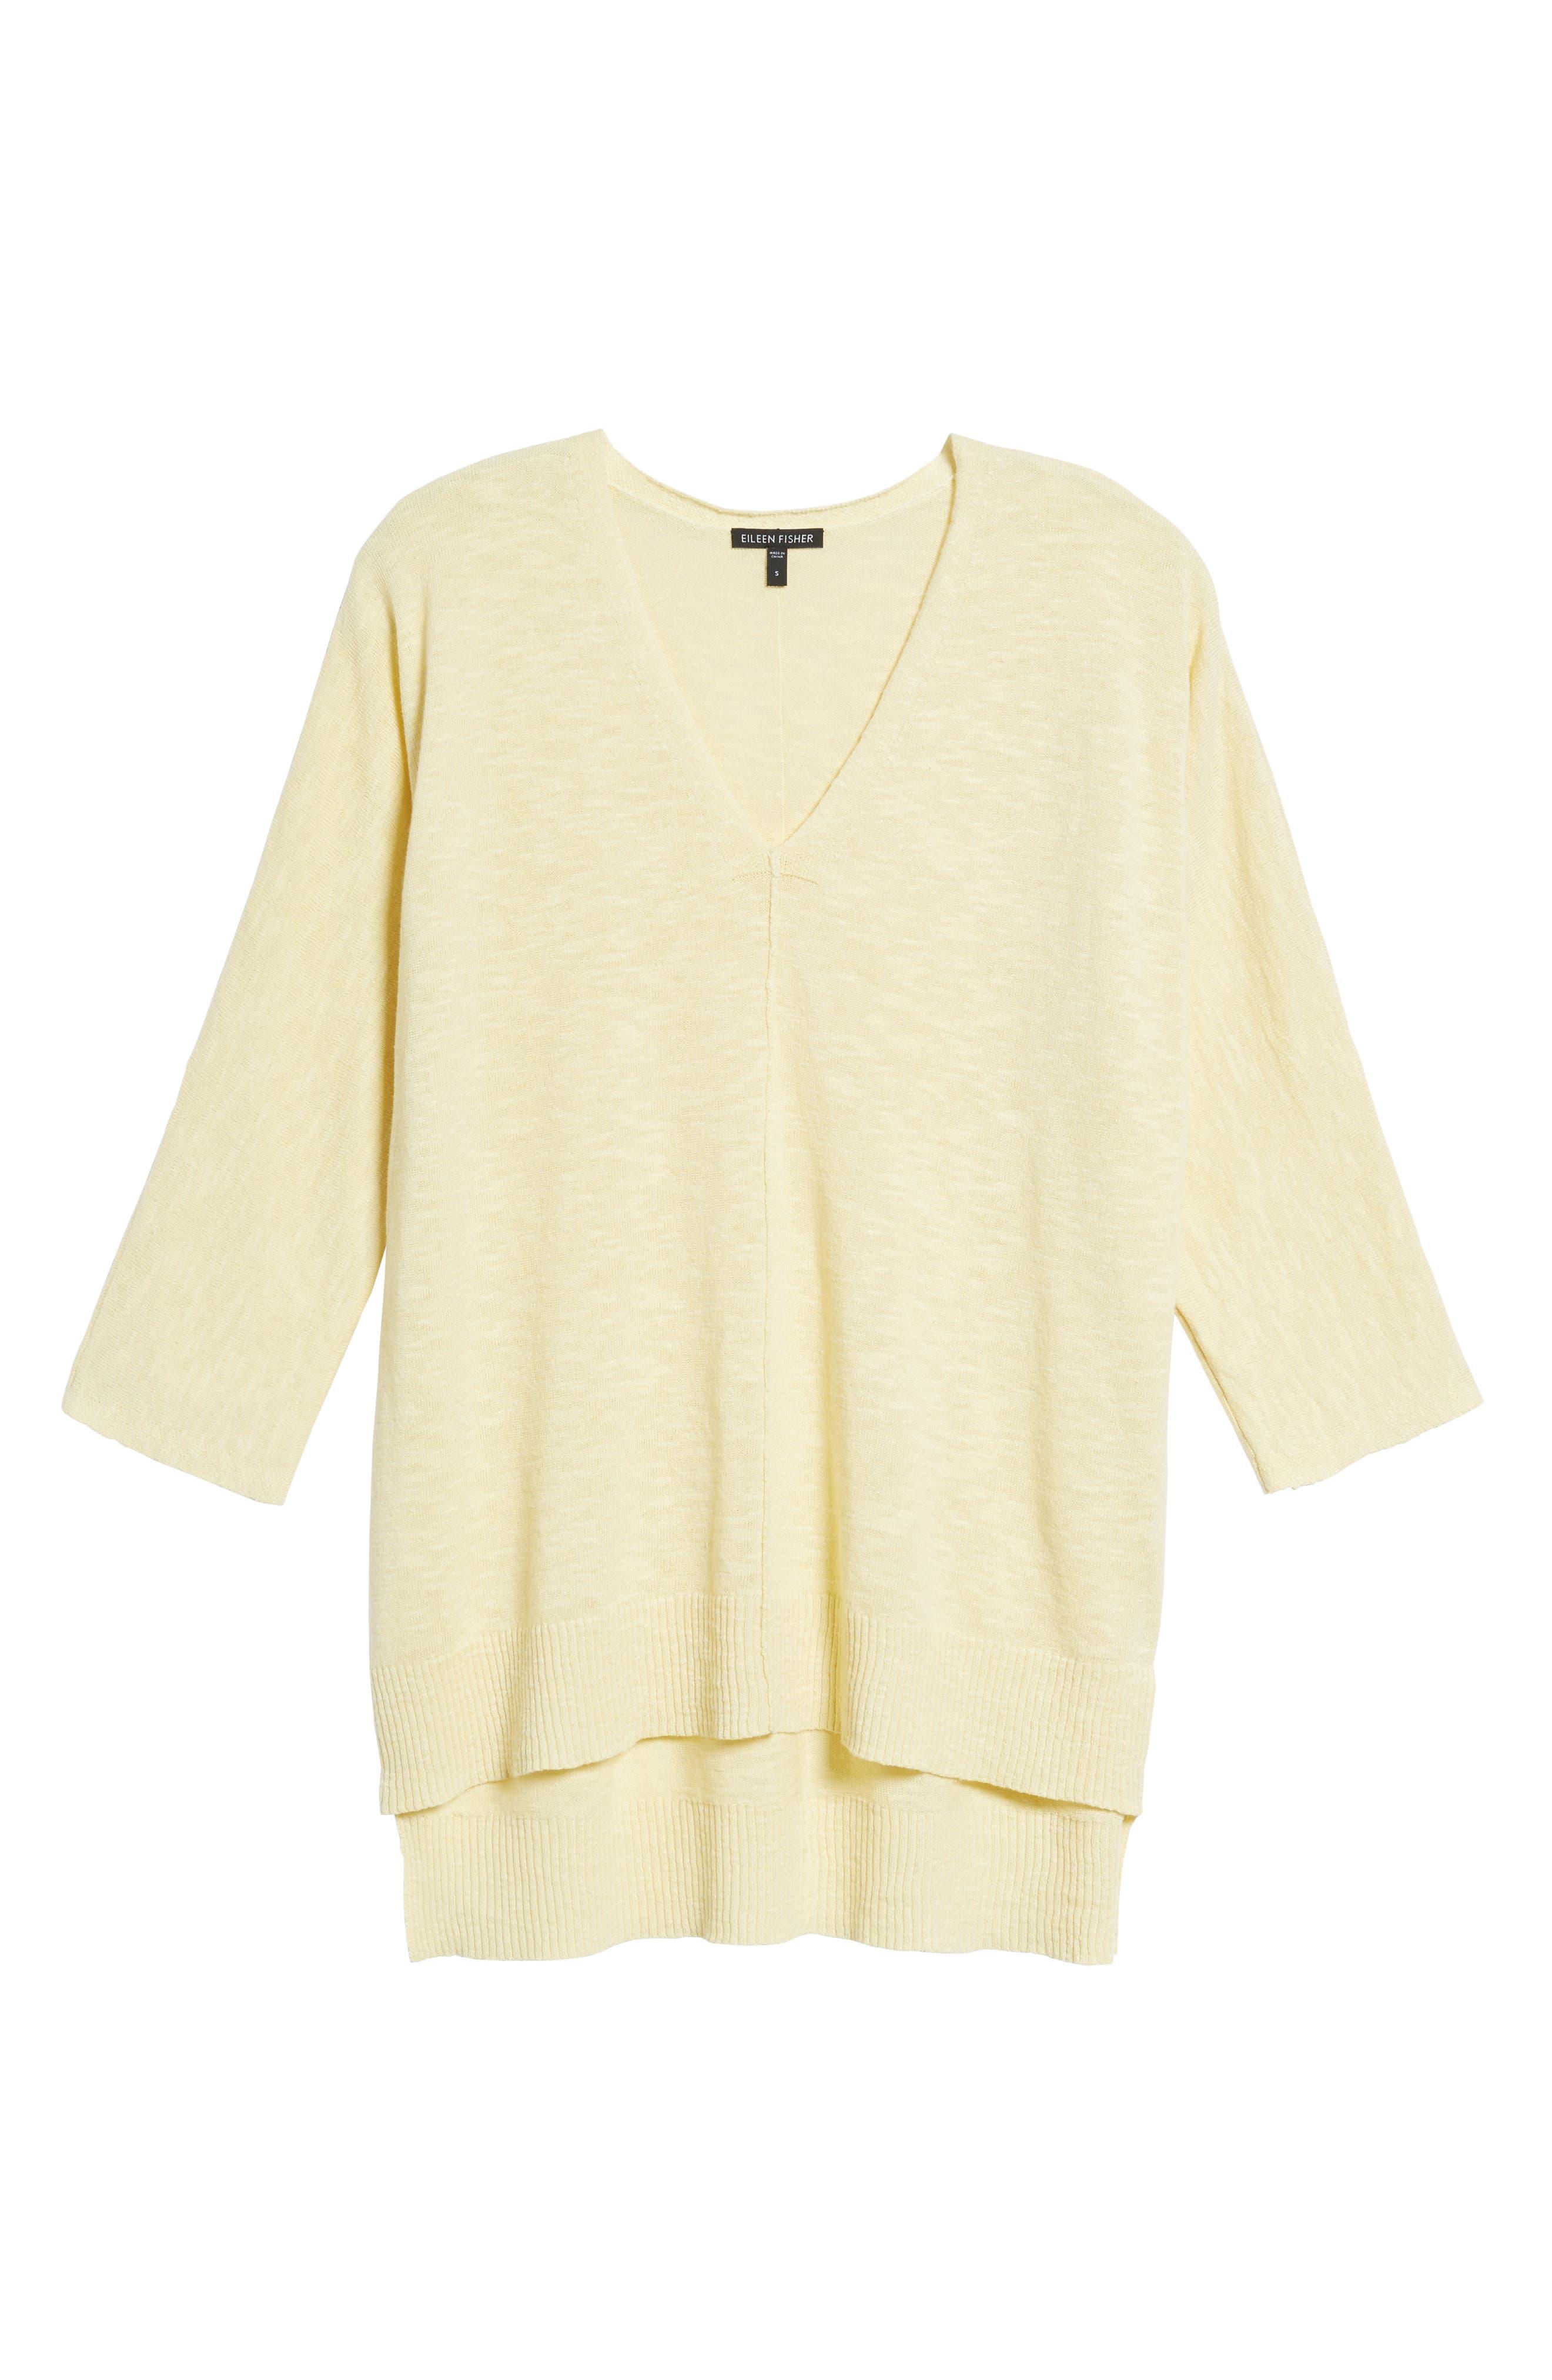 Organic Linen & Cotton Sweater,                             Alternate thumbnail 6, color,                             Flaxen